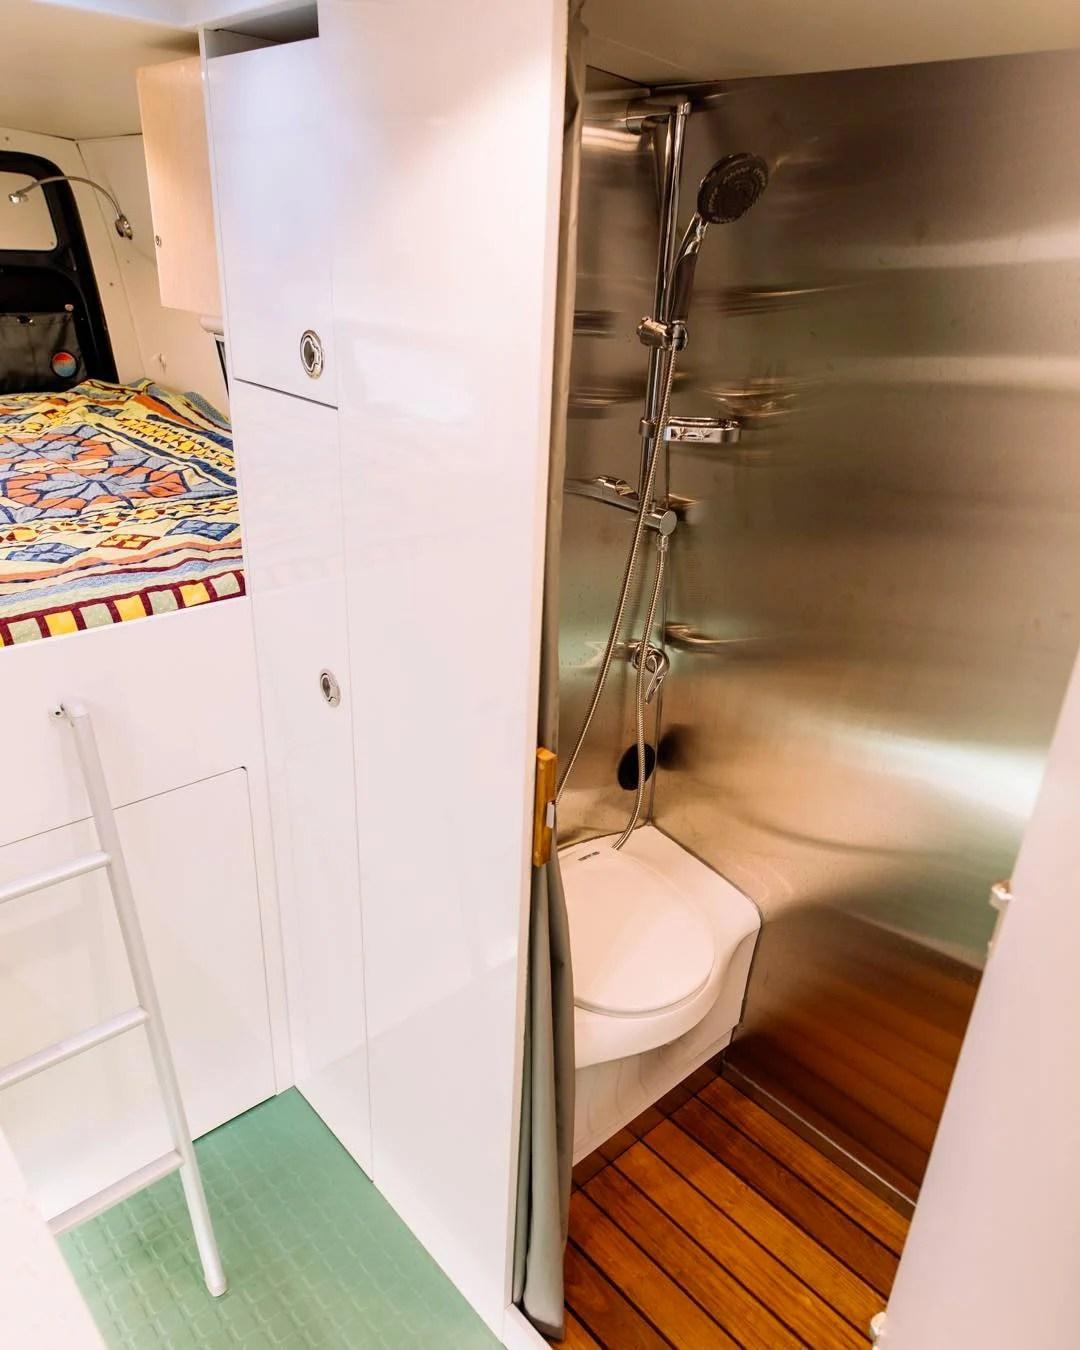 wet bath room in a camper van conversion